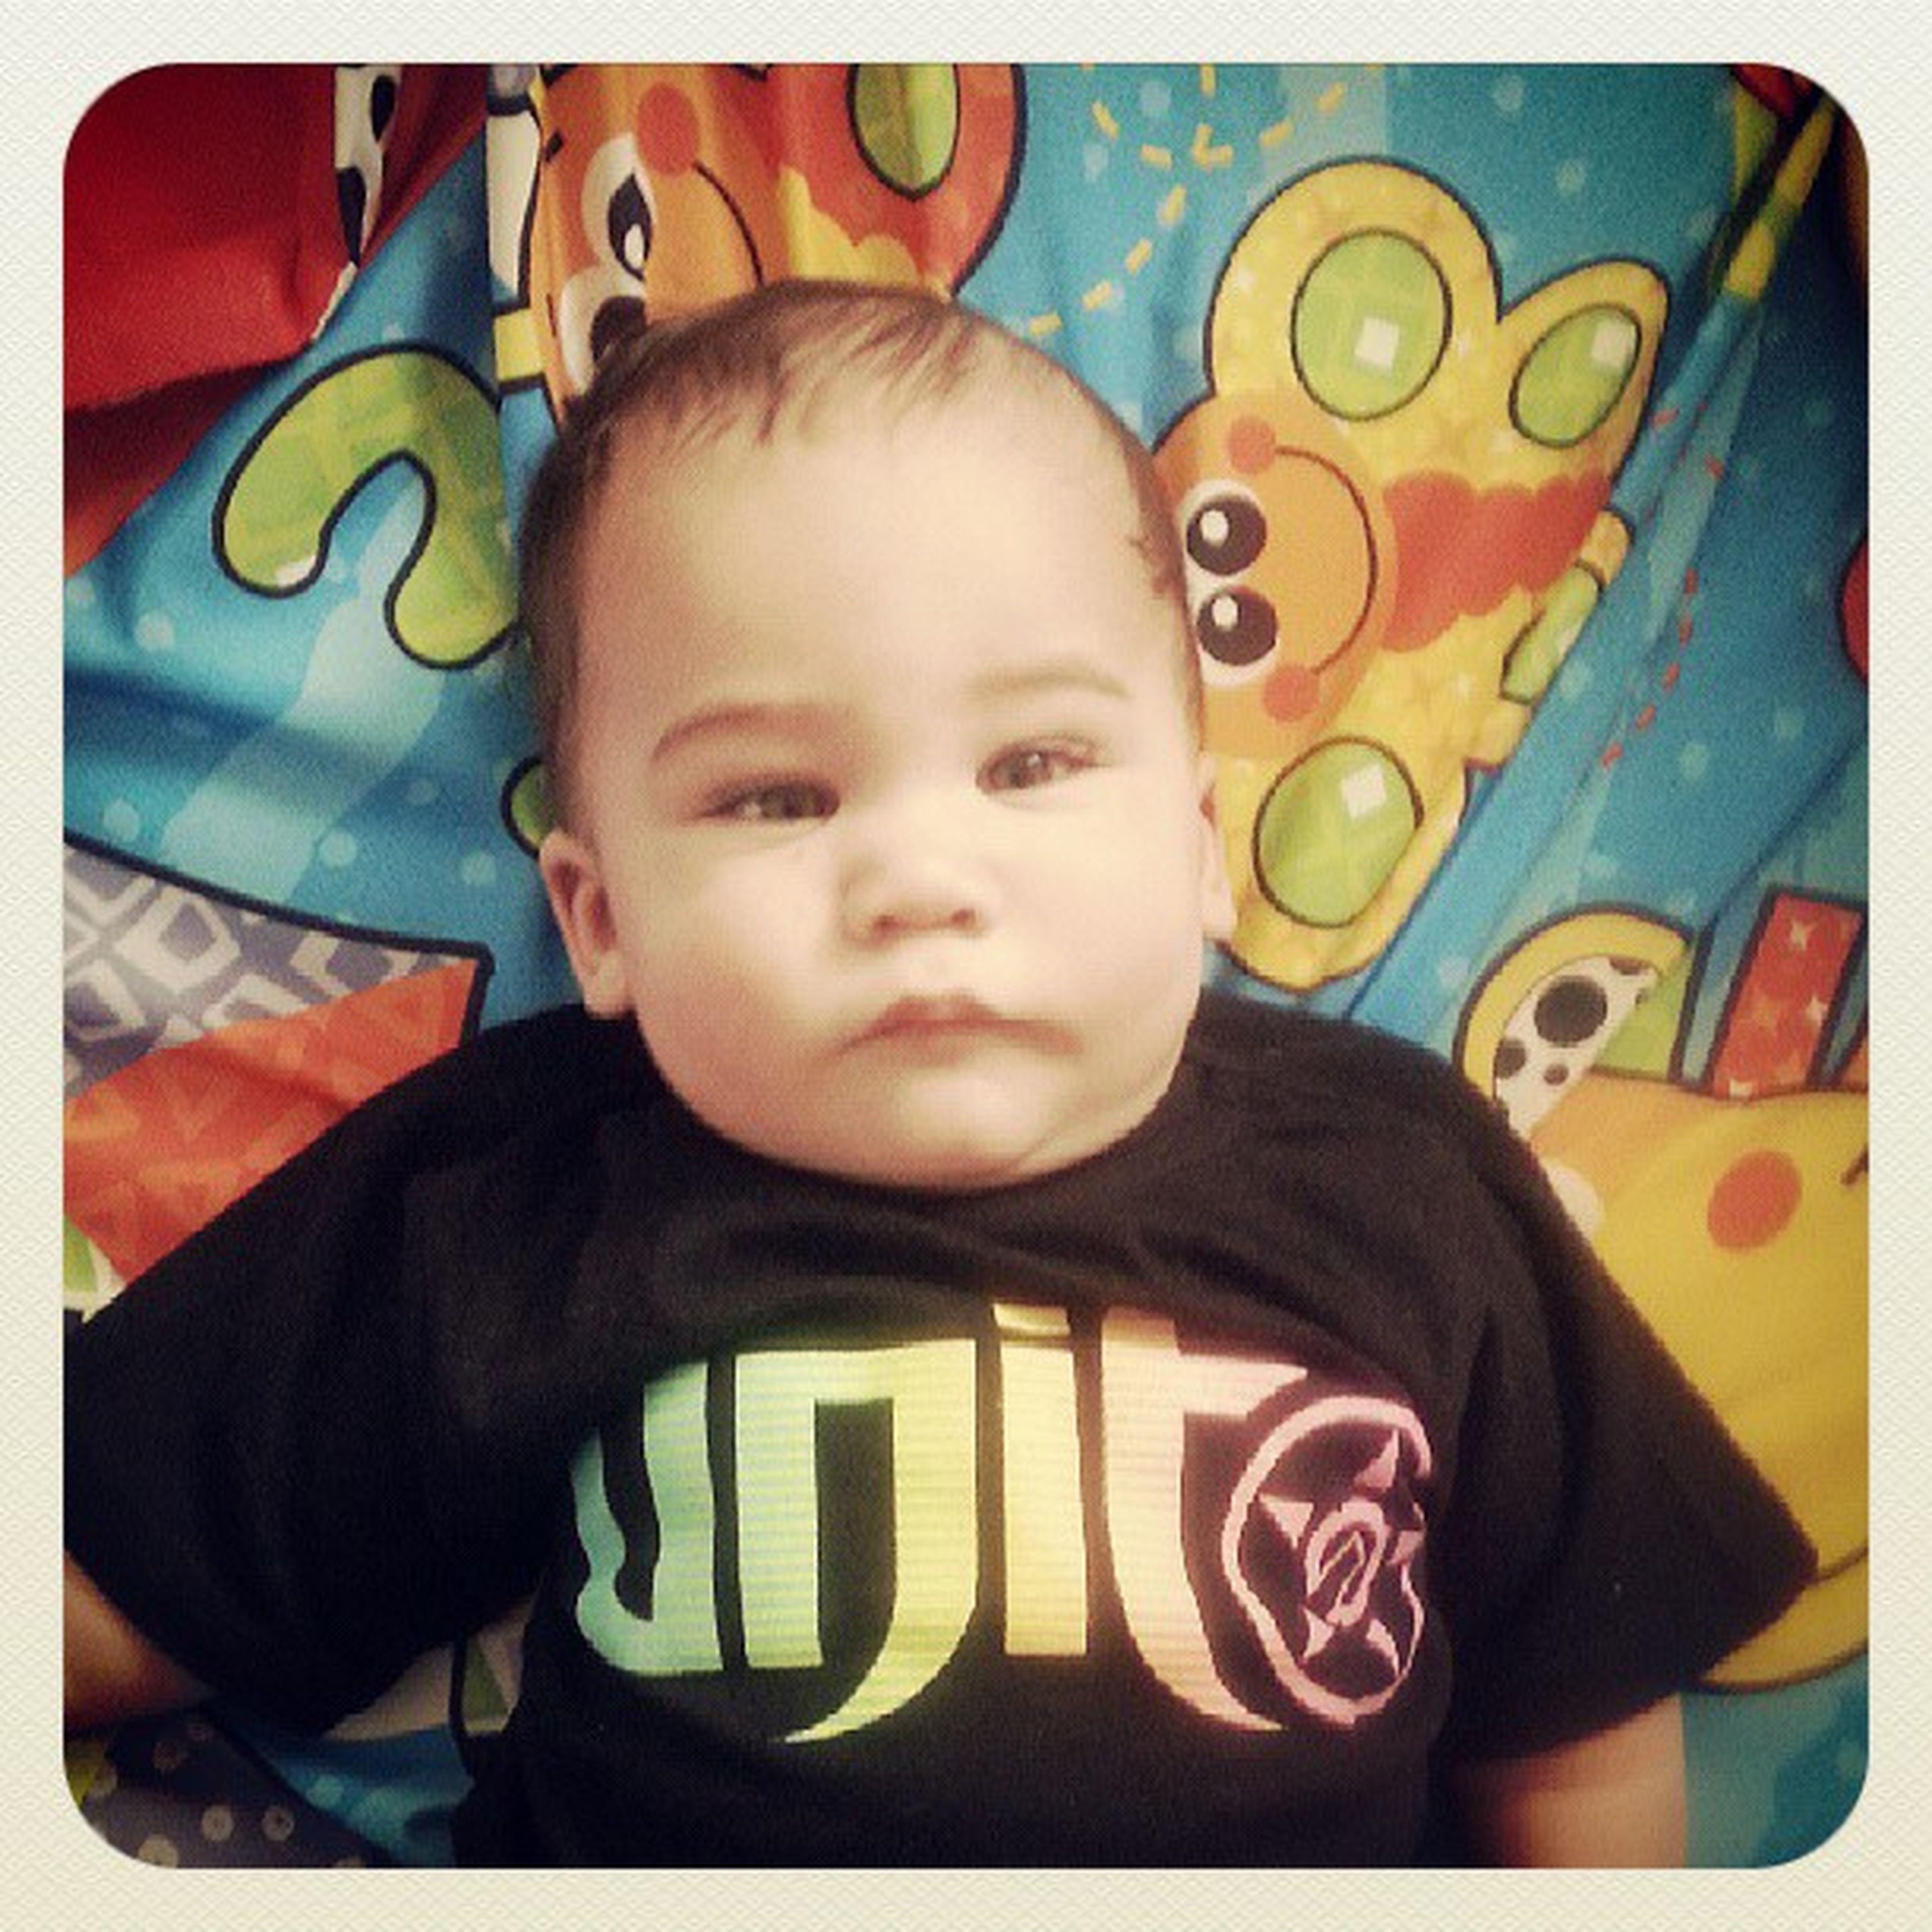 Hangin out wit my lil bro :) ♥ BabyNoah Cutie @cyonah